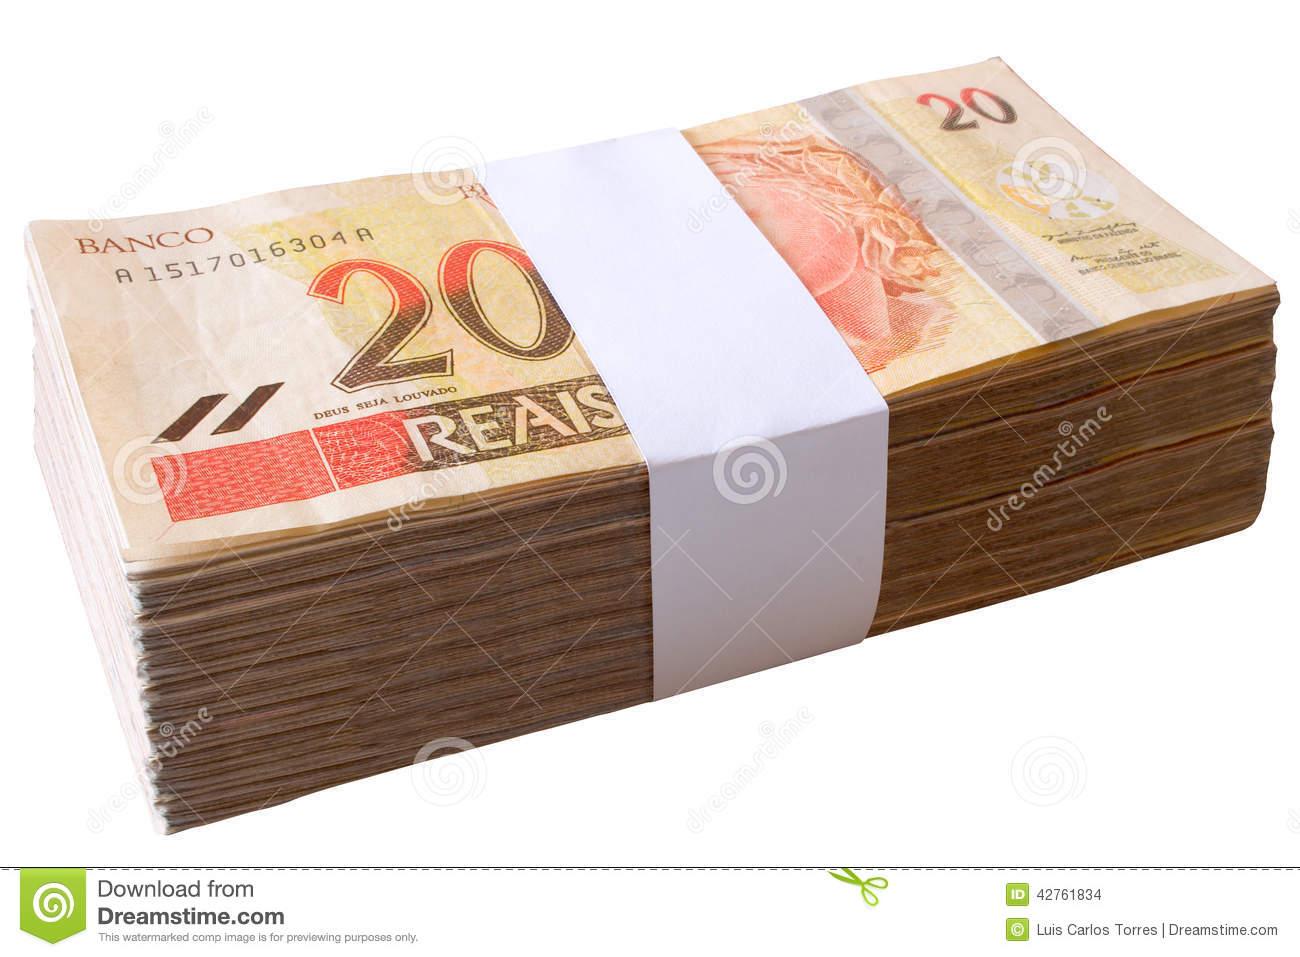 R$ 20,00